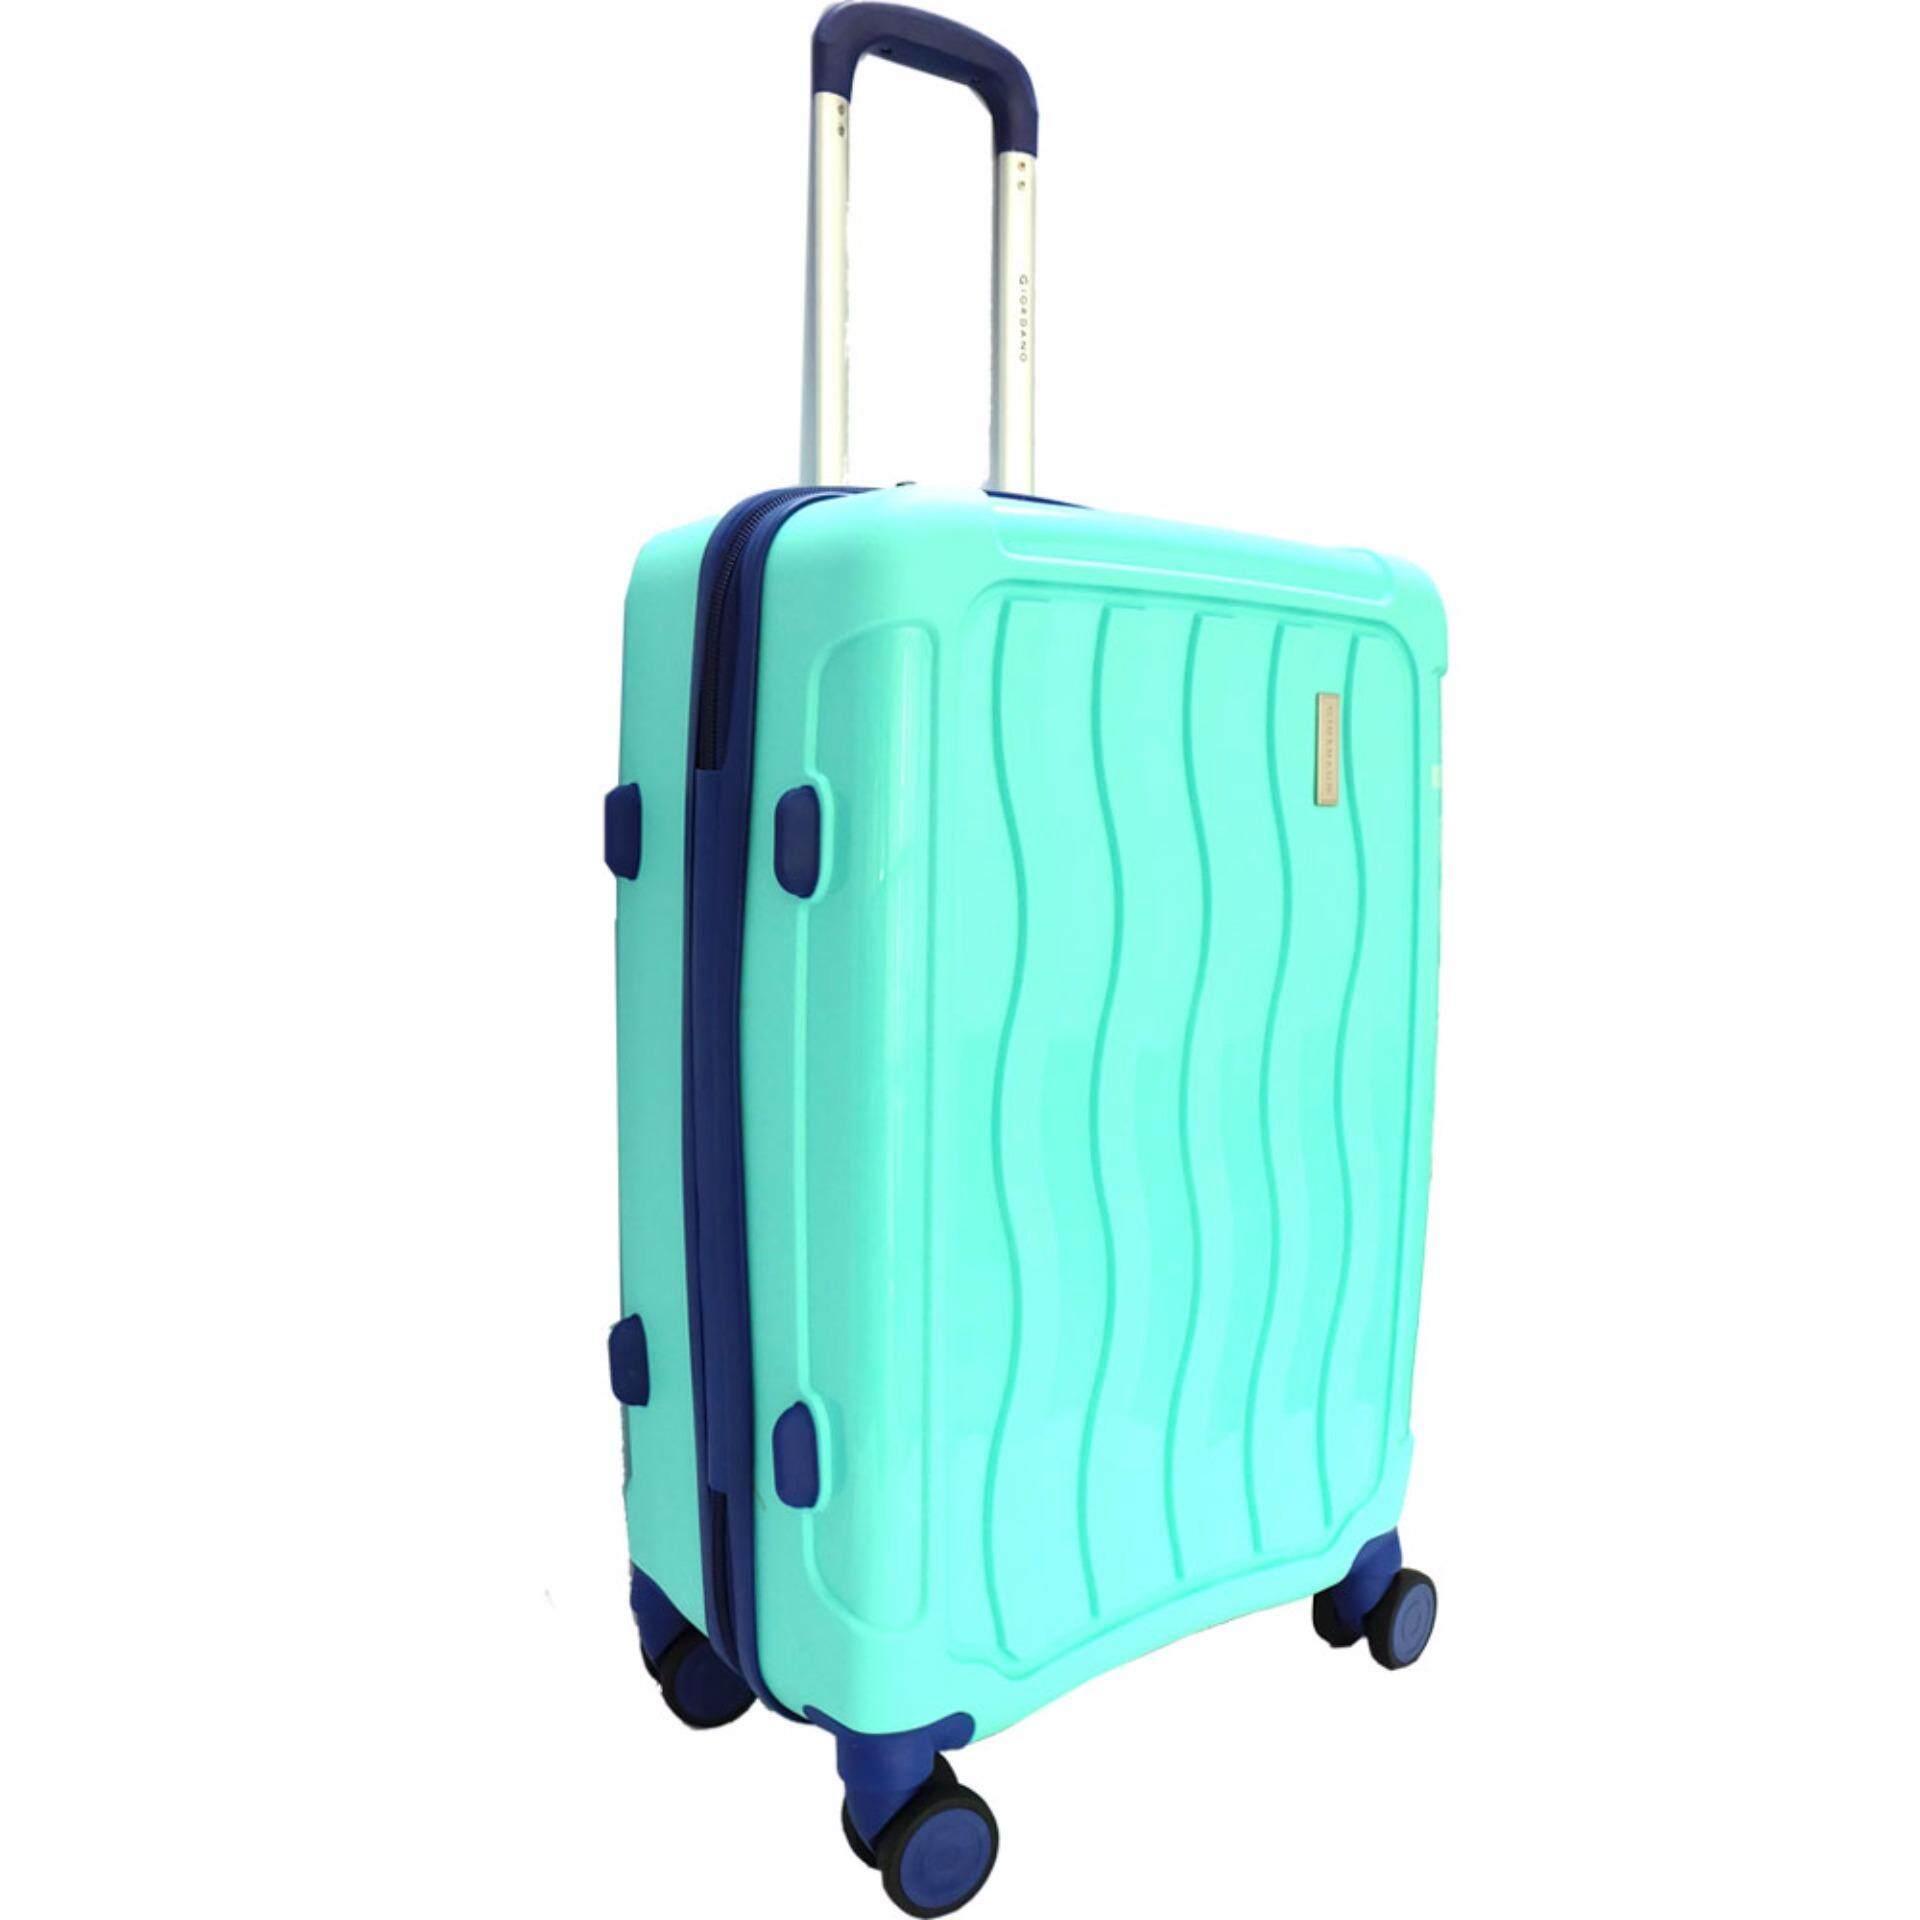 Giordano GA9500 28 Inch Unbreakable PP Hard Case Trolley (Green)